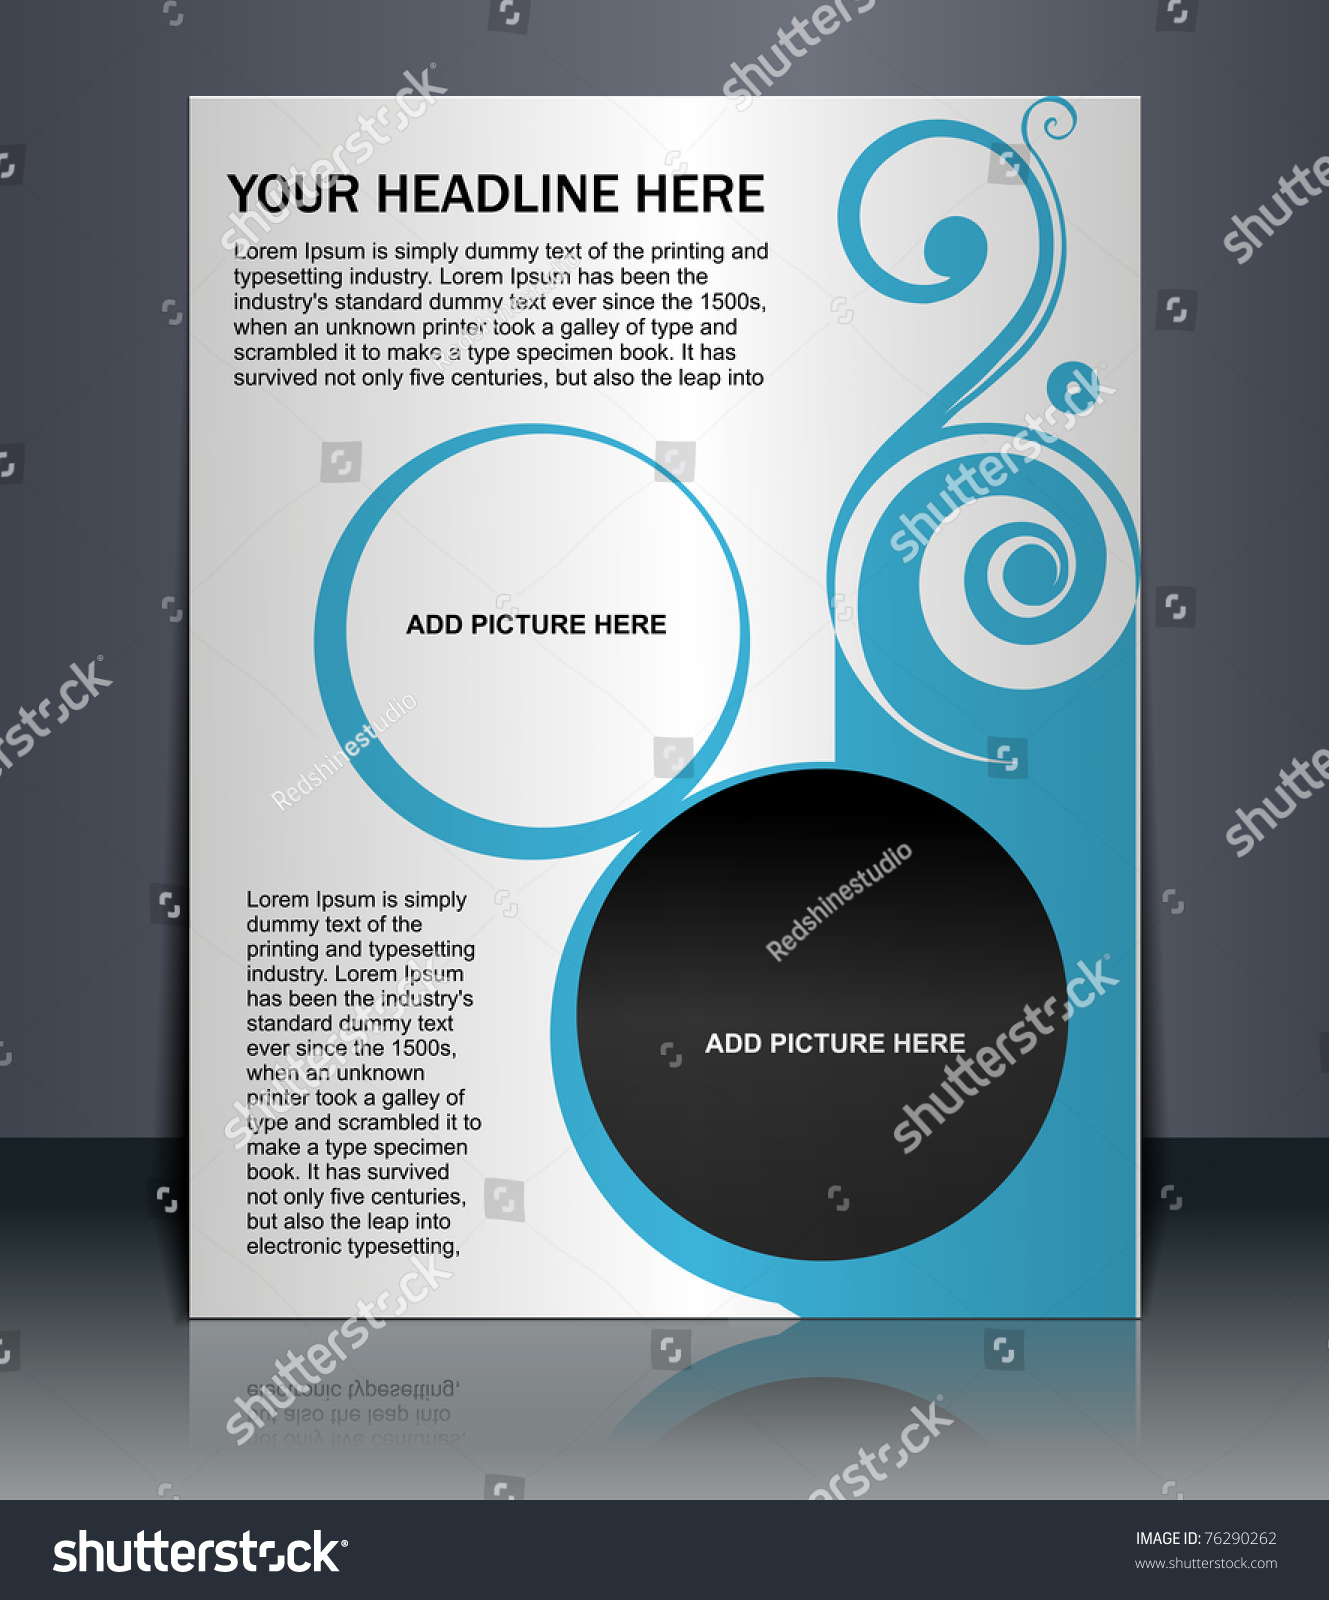 presentation flyer design content background editable stock vector presentation of flyer design content background editable vector illustration